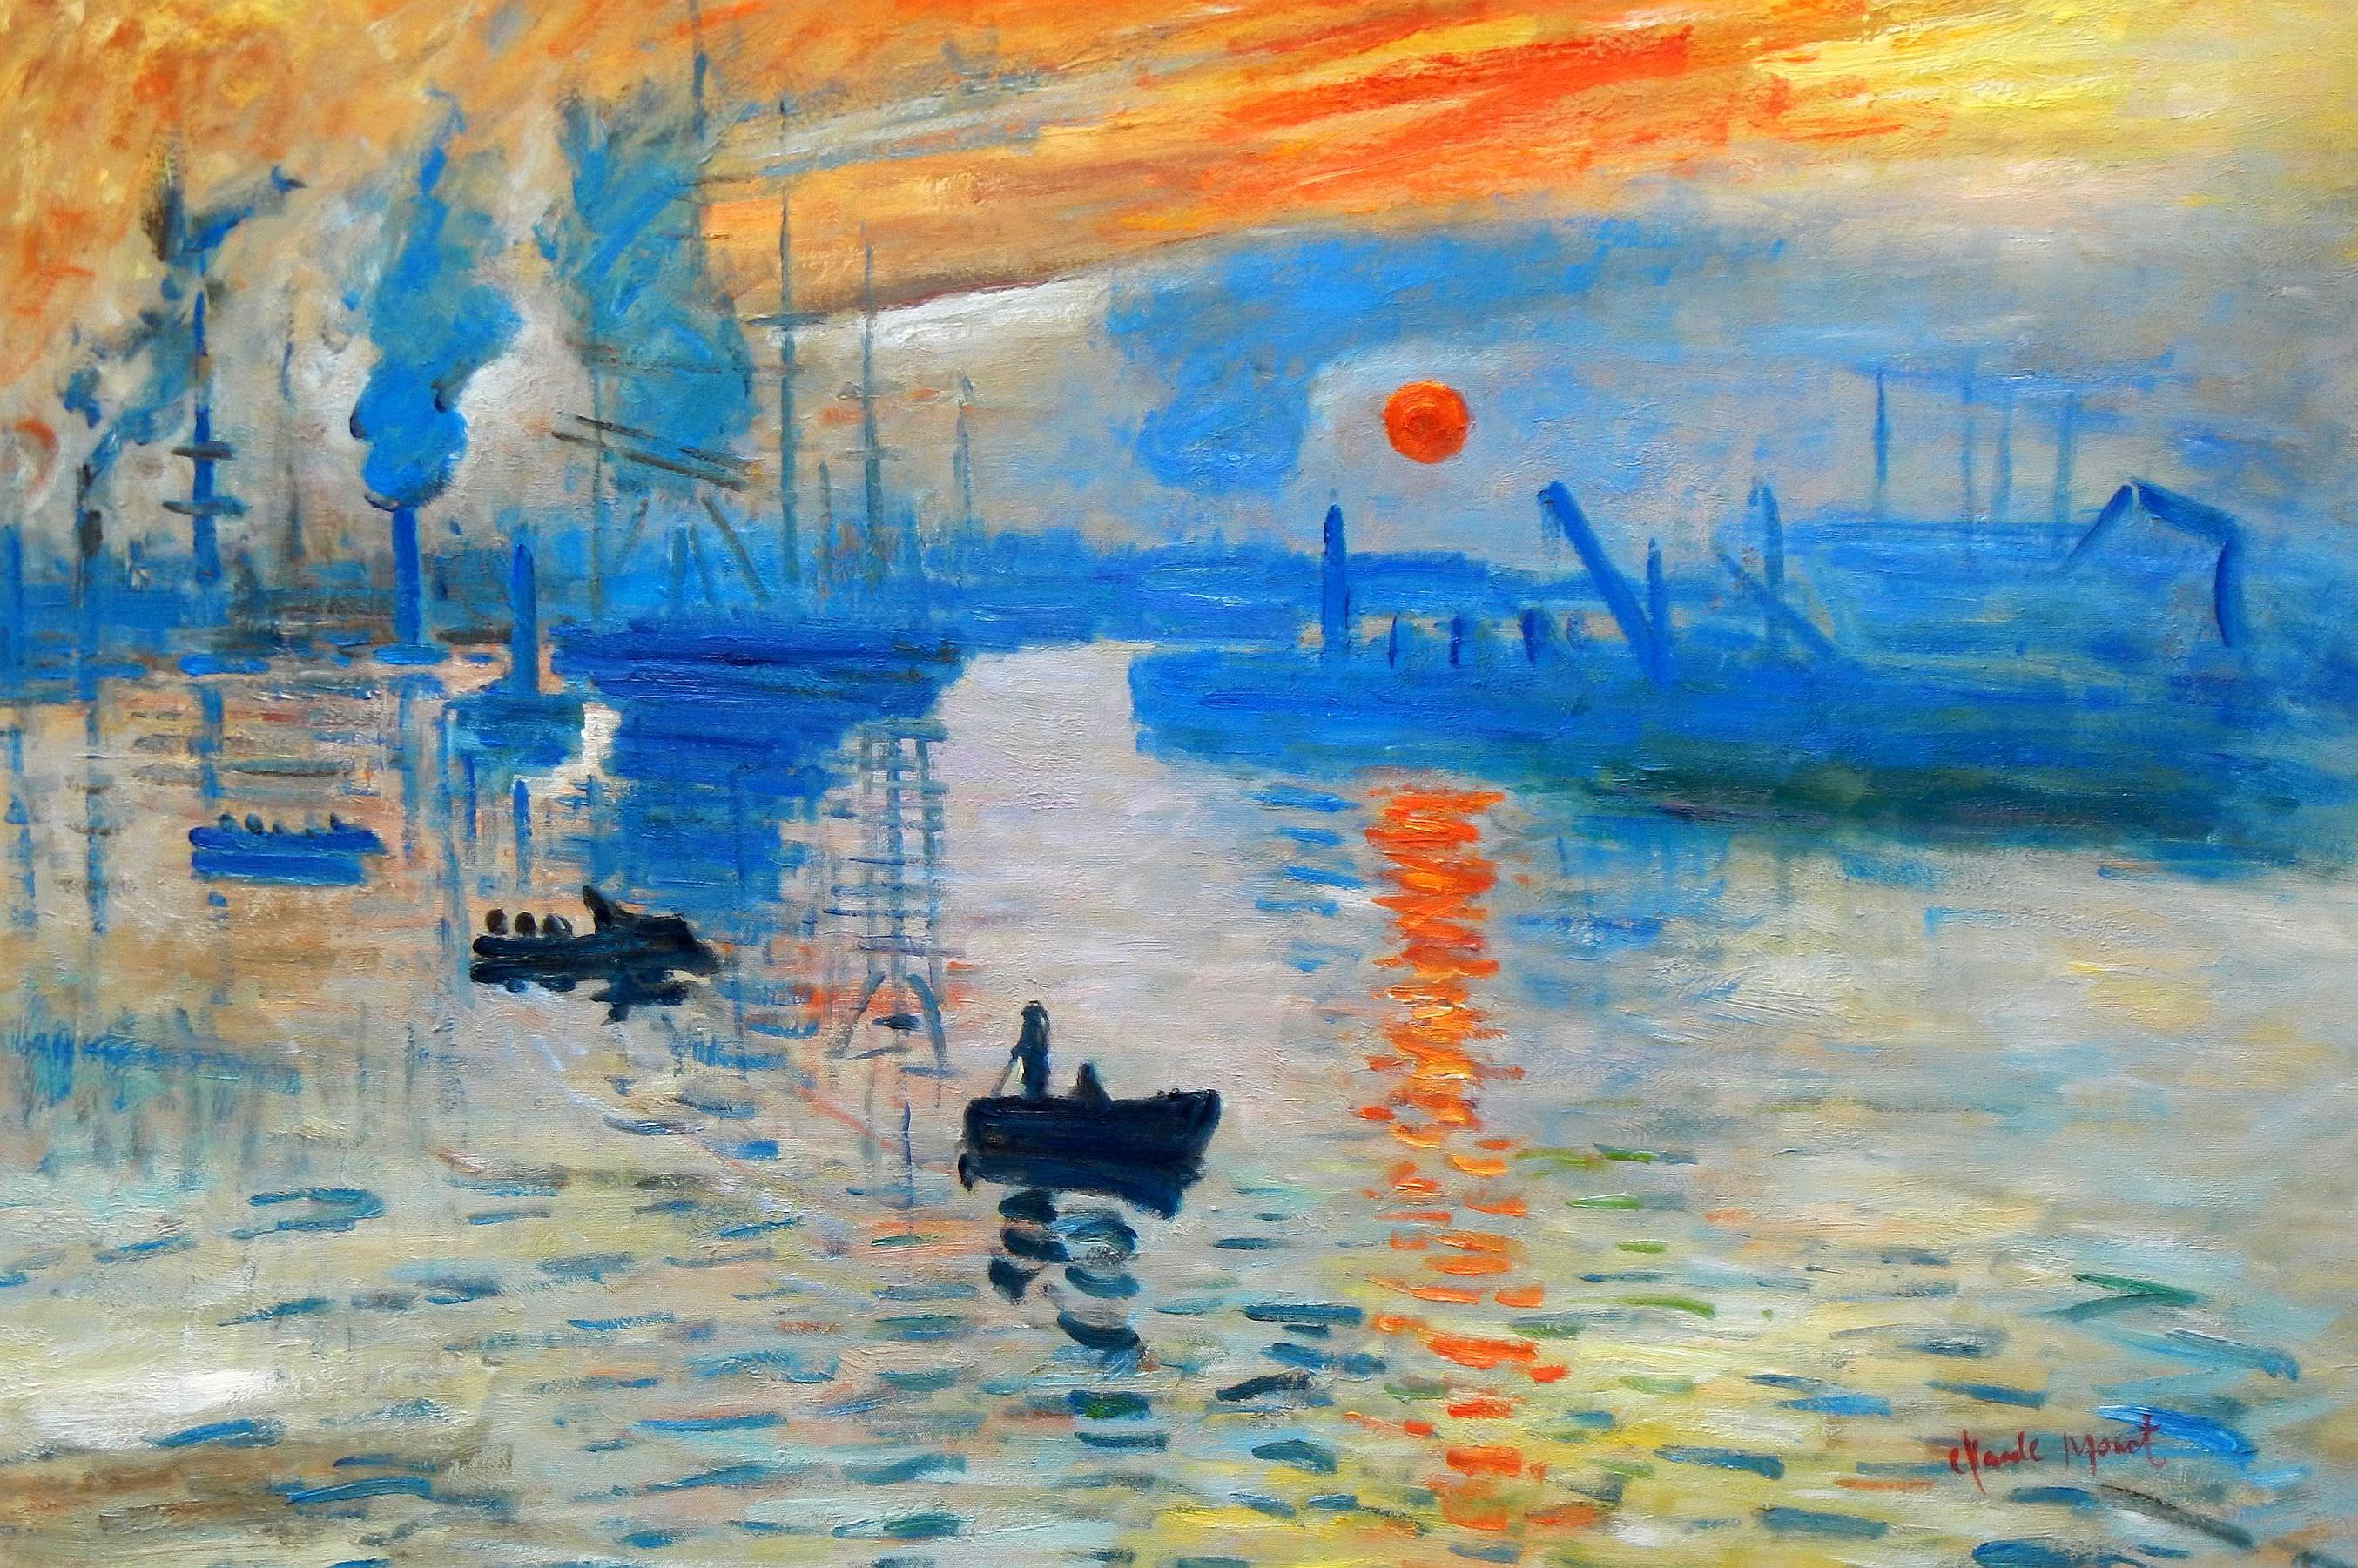 Claude Monet - Sonnenaufgang d93372 60x90cm Ölgemälde handgemalt